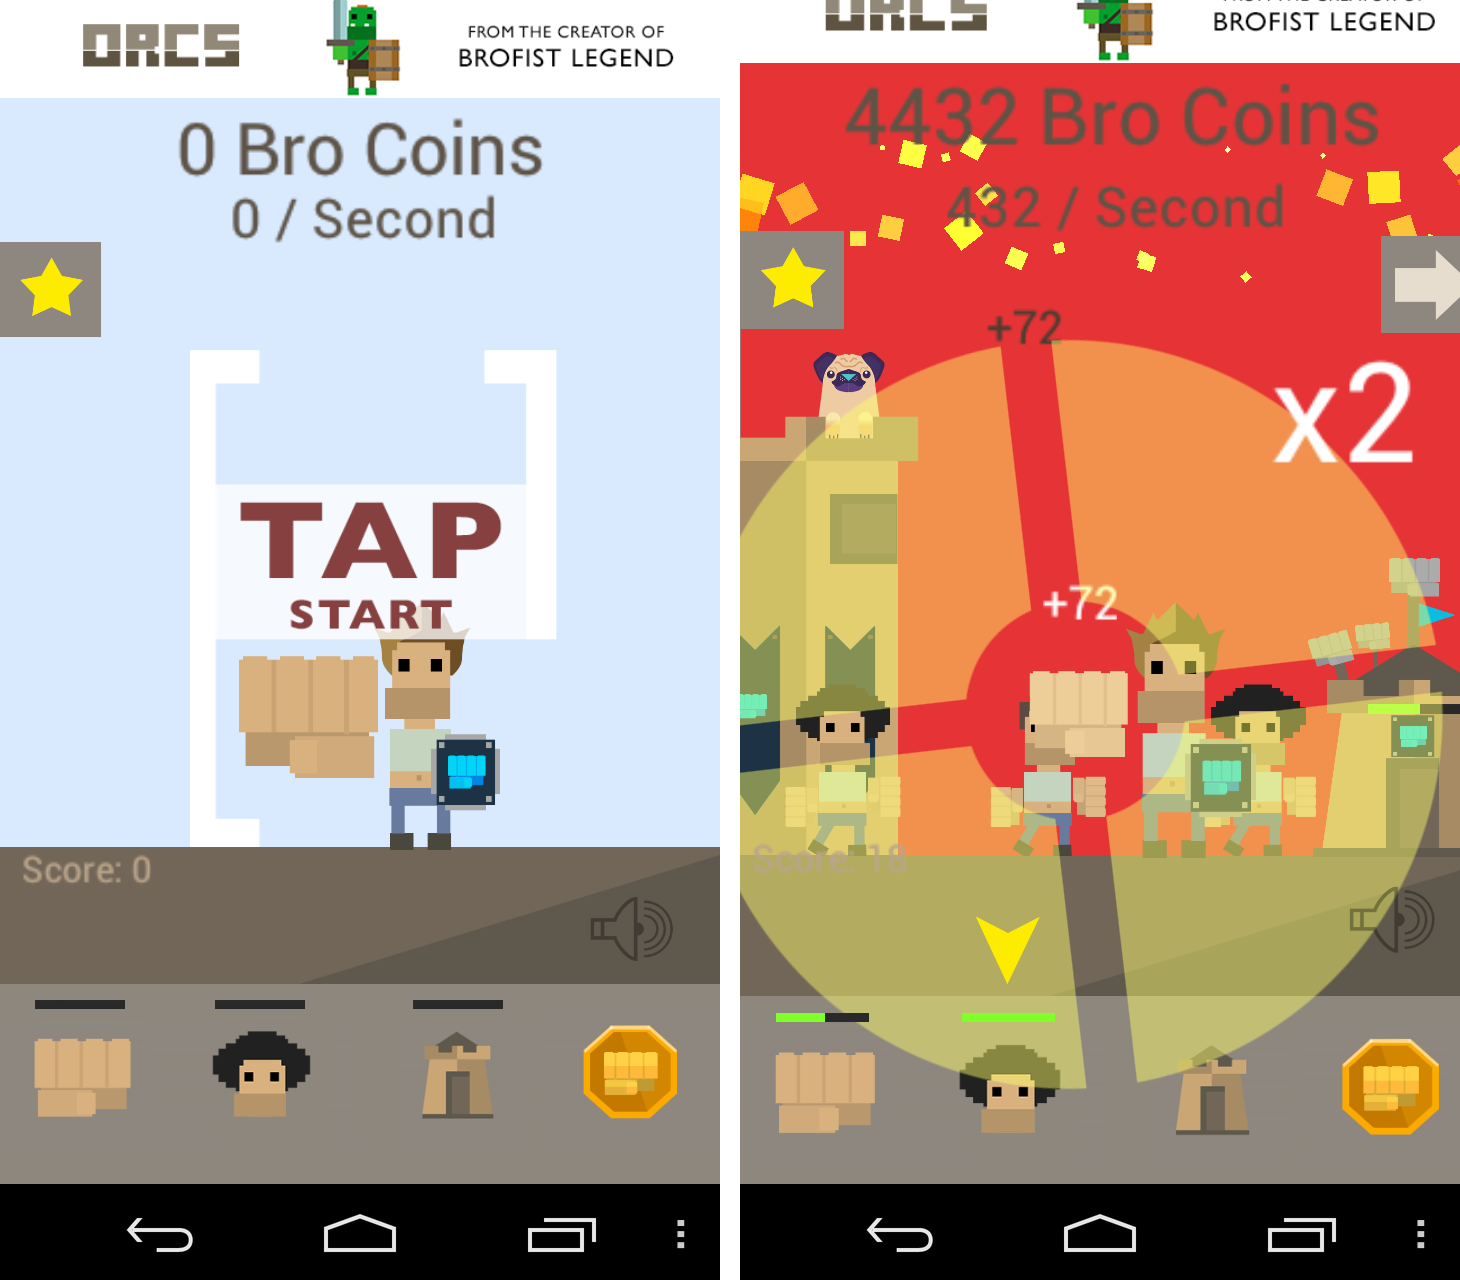 Brofist Legend androidアプリスクリーンショット1